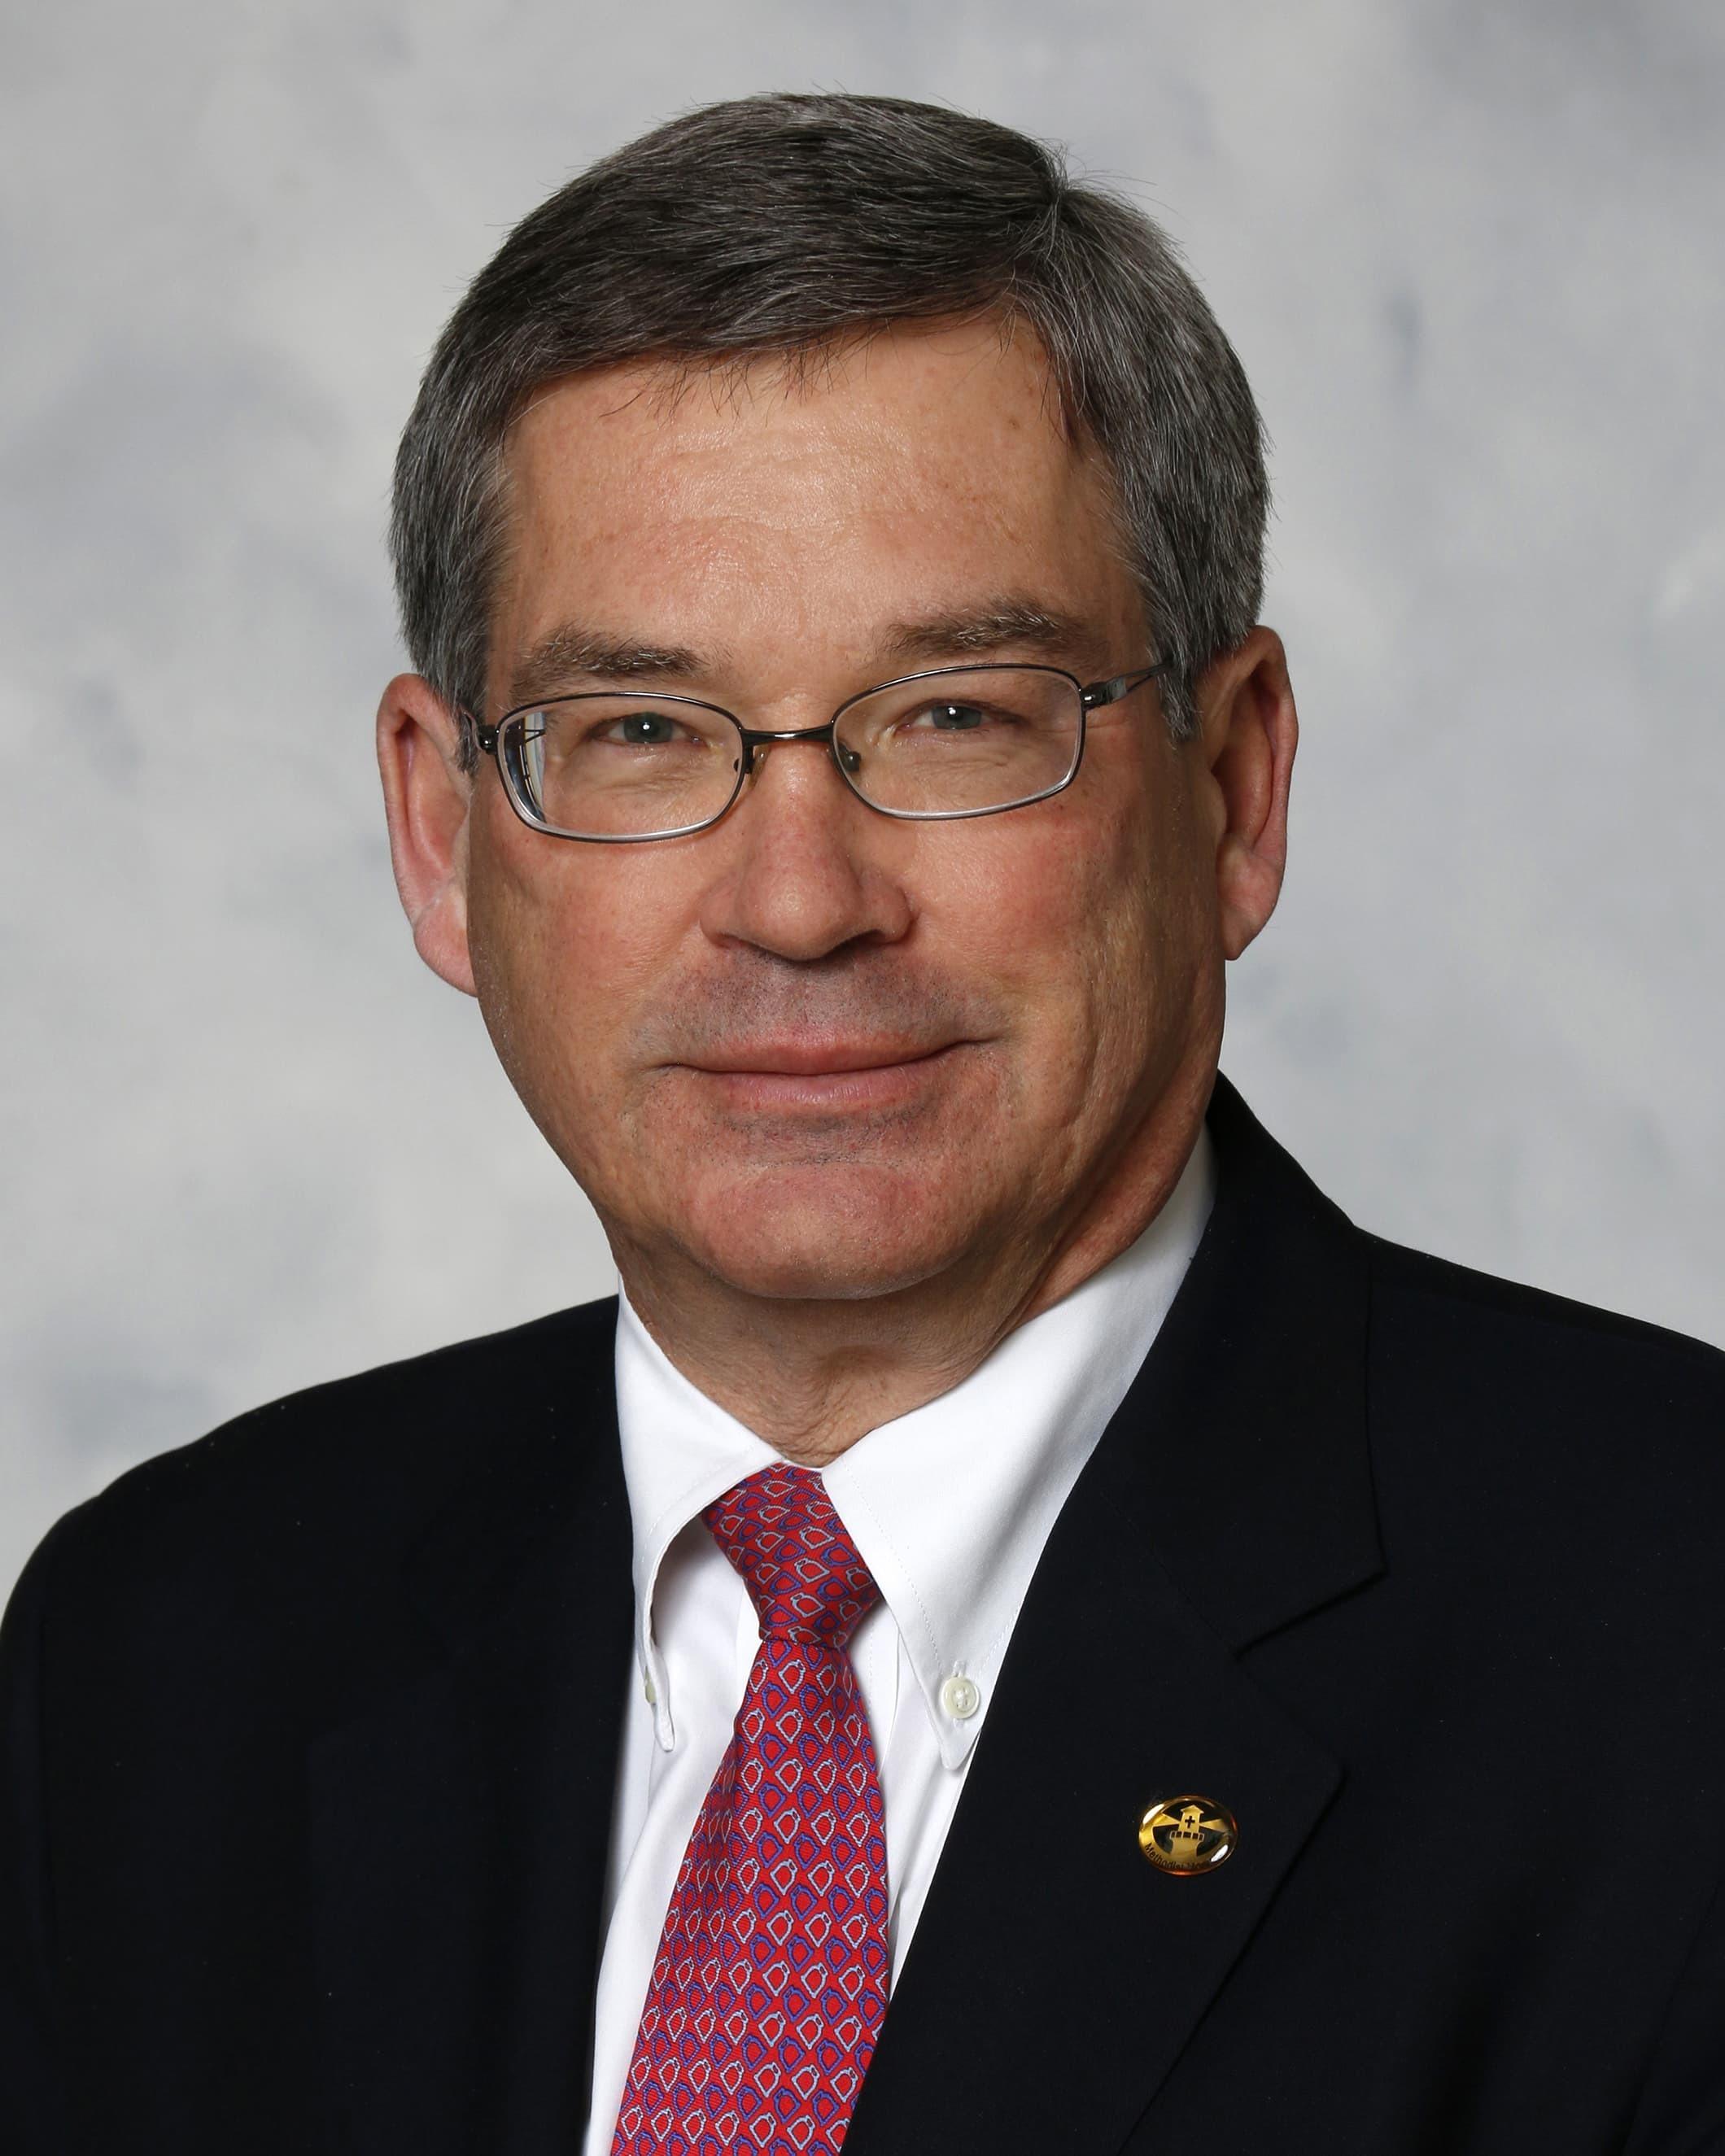 James E. Lingeman